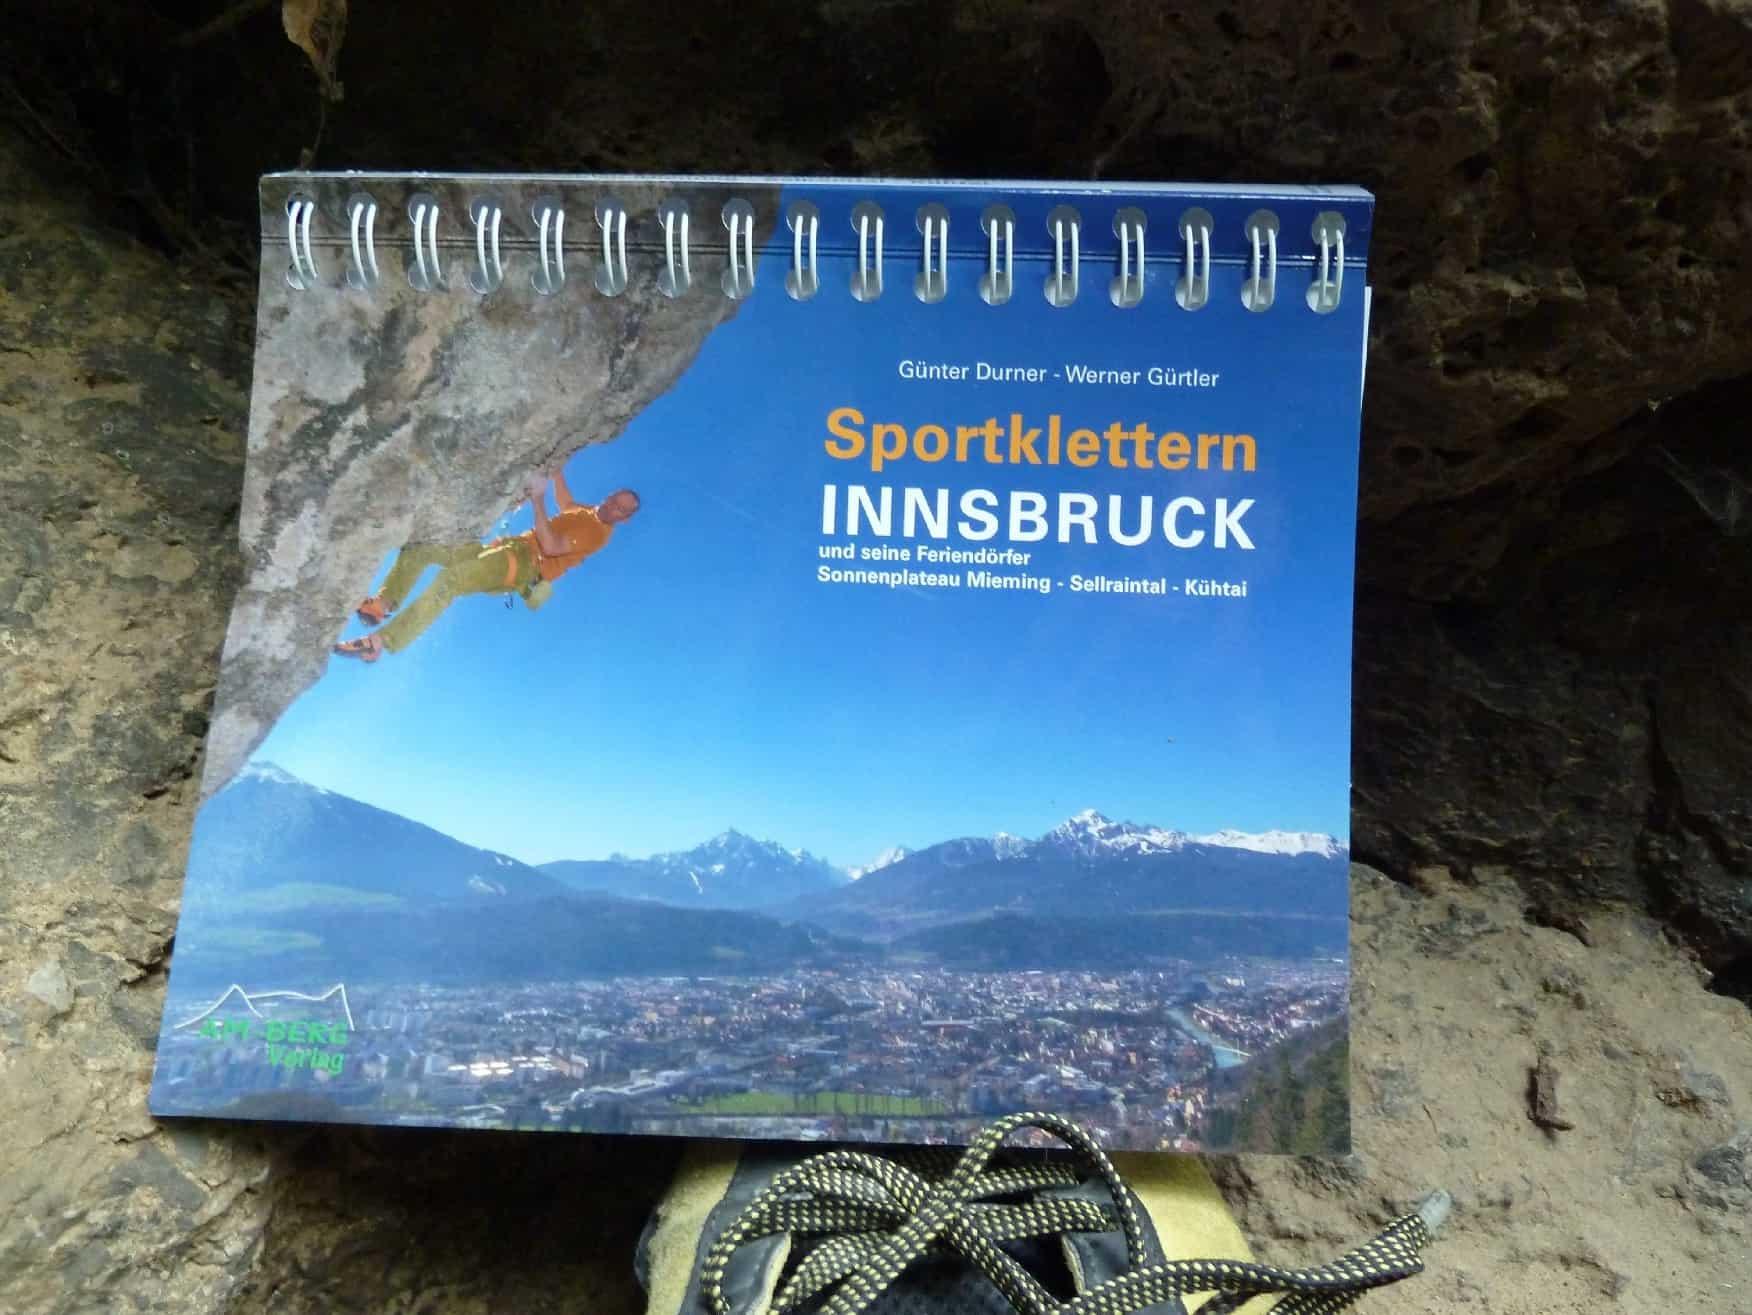 Höttinger Steinbruch bei Innsbruck